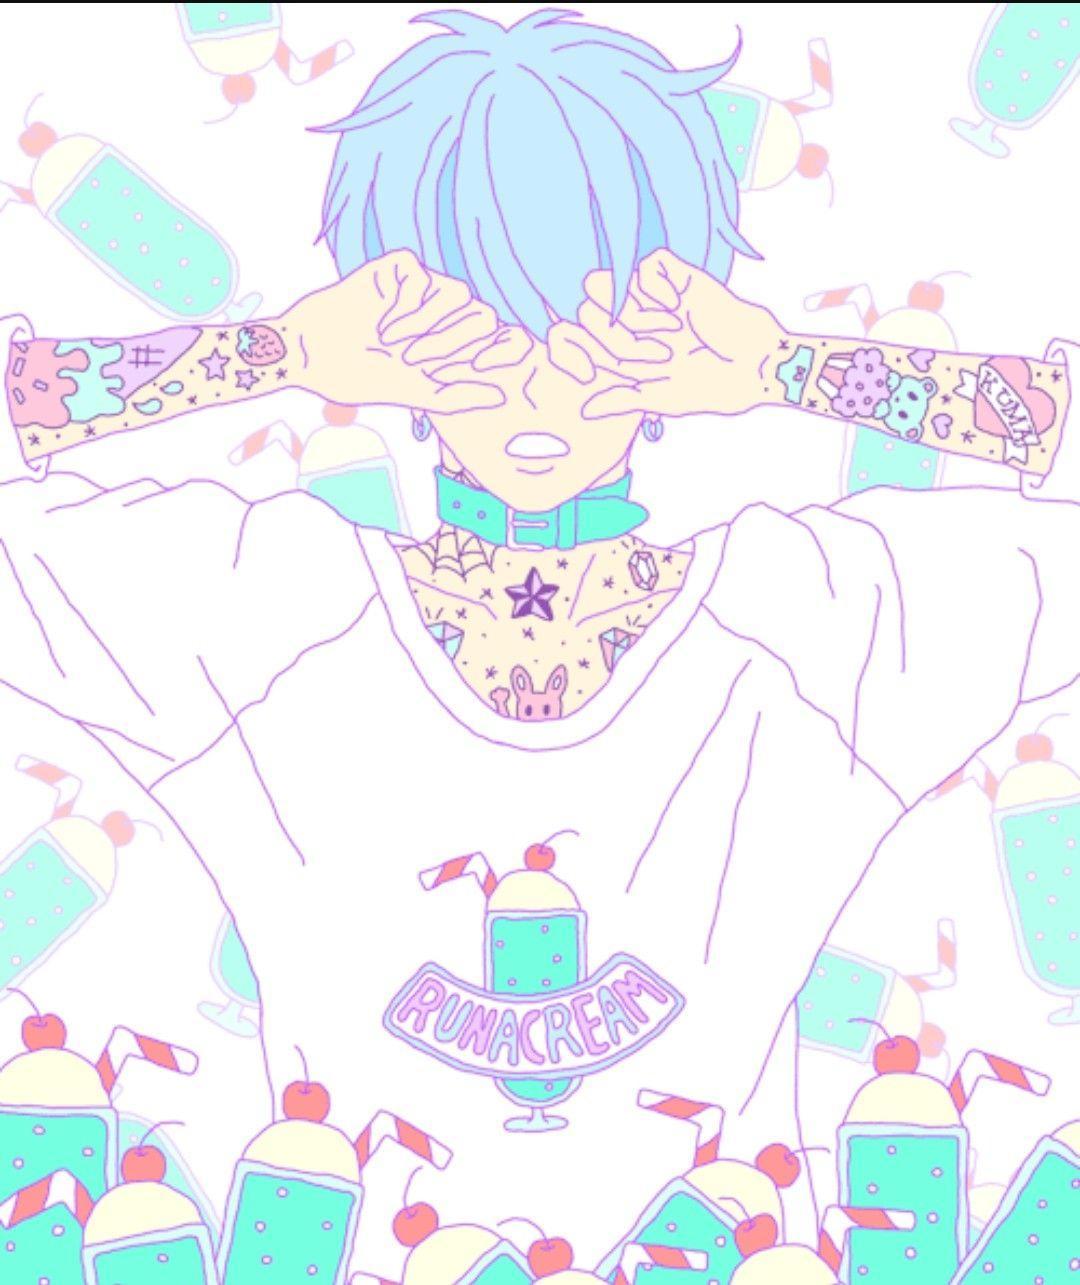 Cute Anime Wallpapers: Kawaii Aesthetic Wallpapers